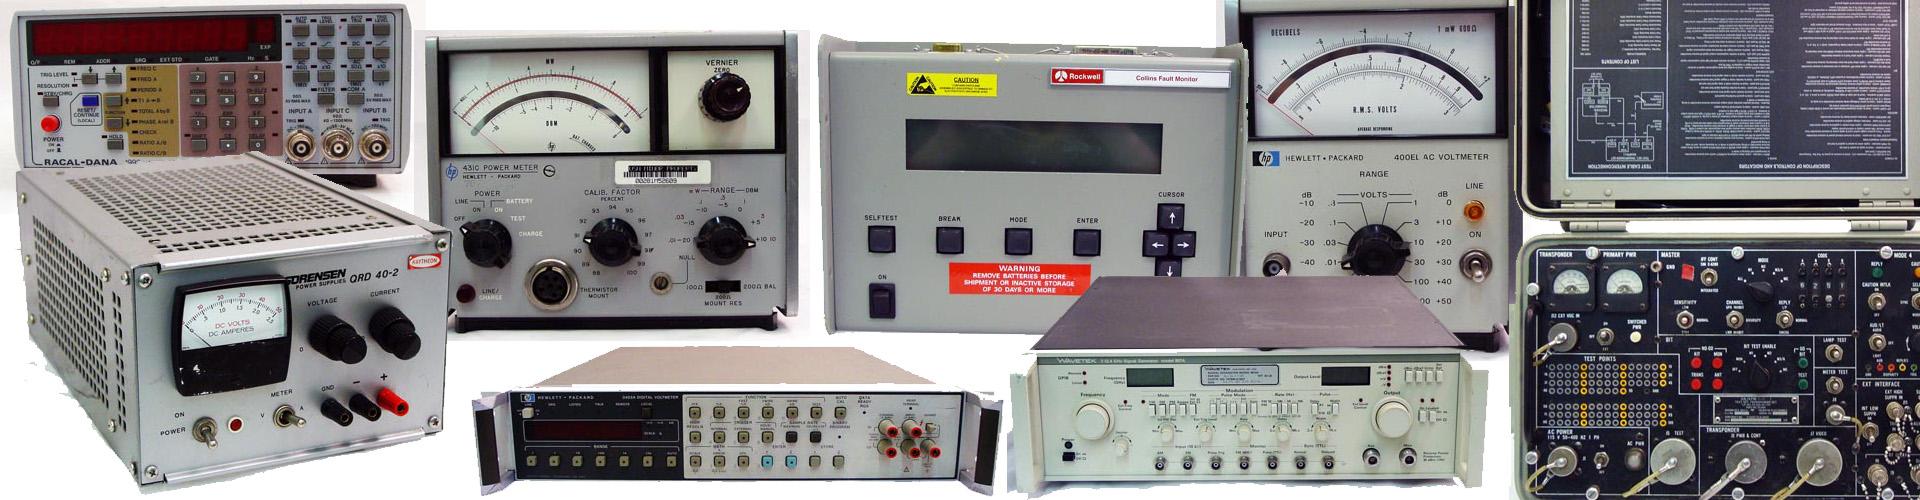 Avionics Specialist Inc Products Surplus Test Equipment Wiring Harness Testing